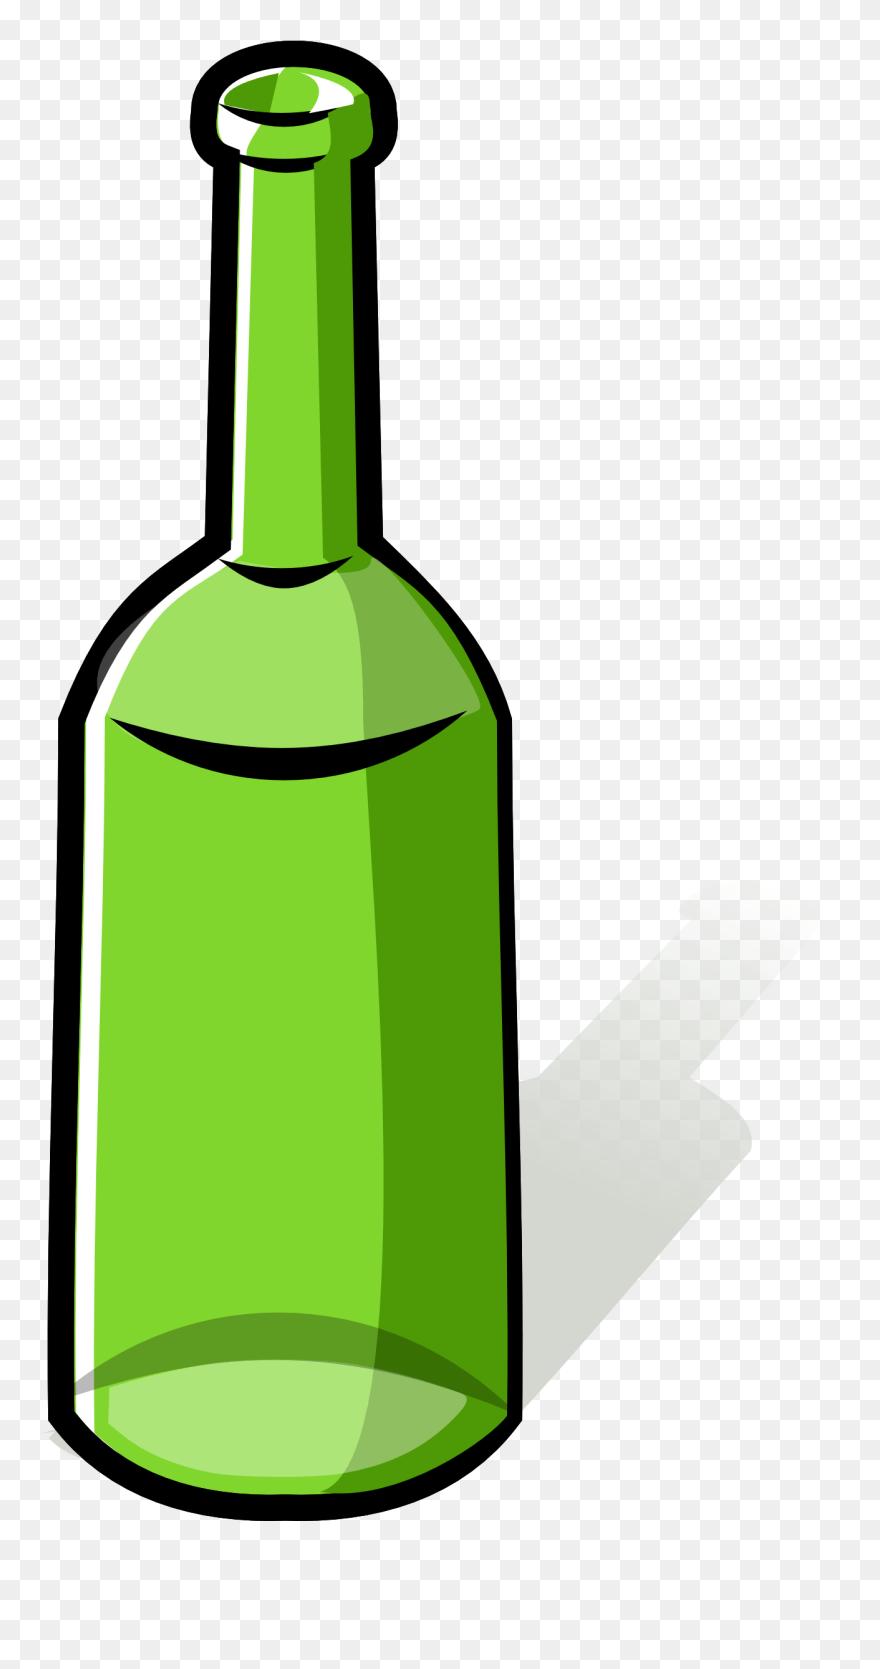 medium resolution of soda bottle clipart bottle clipart png download